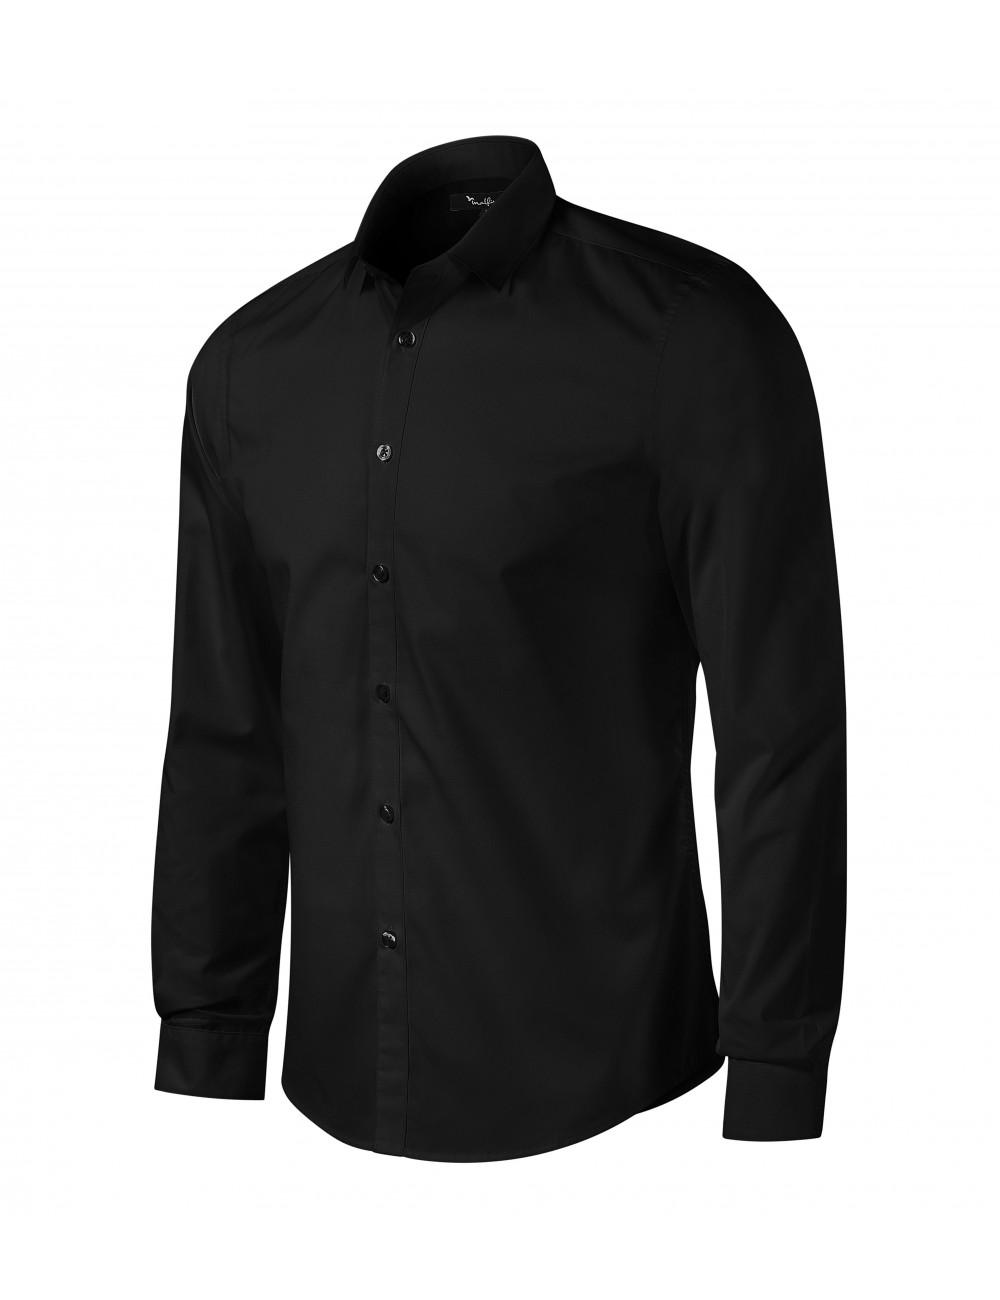 Adler MALFINIPREMIUM Koszula męska Dynamic 262 czarny